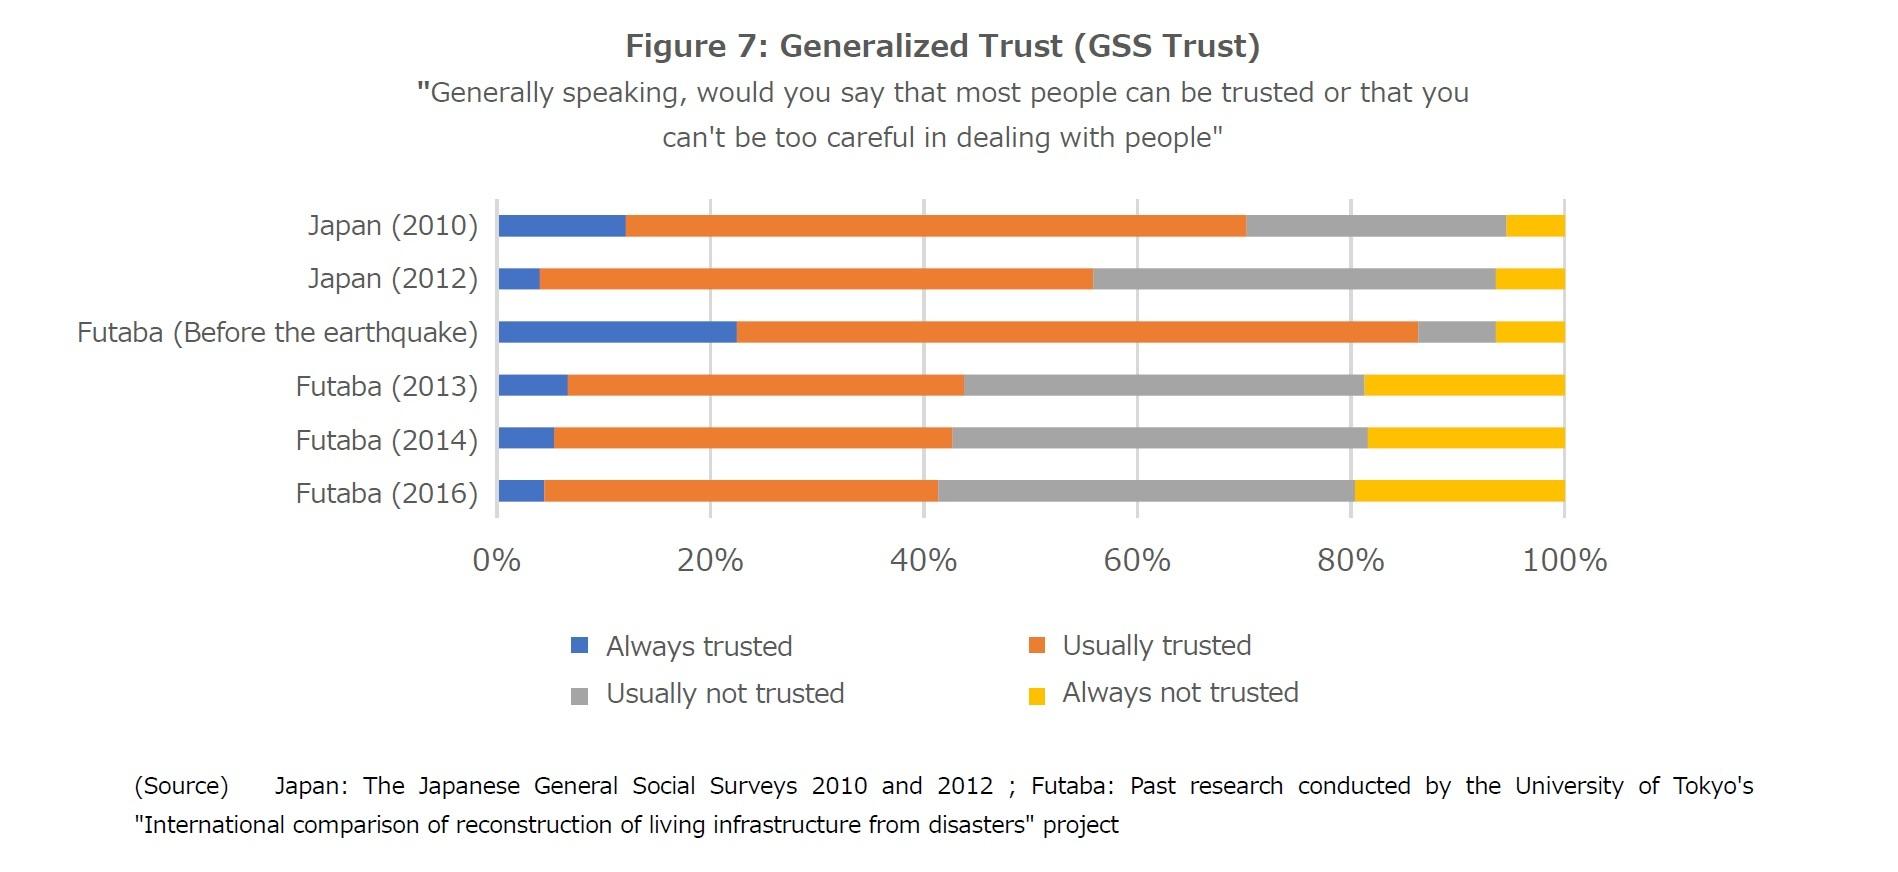 Figure 7: Generalized Trust (GSS Trust)